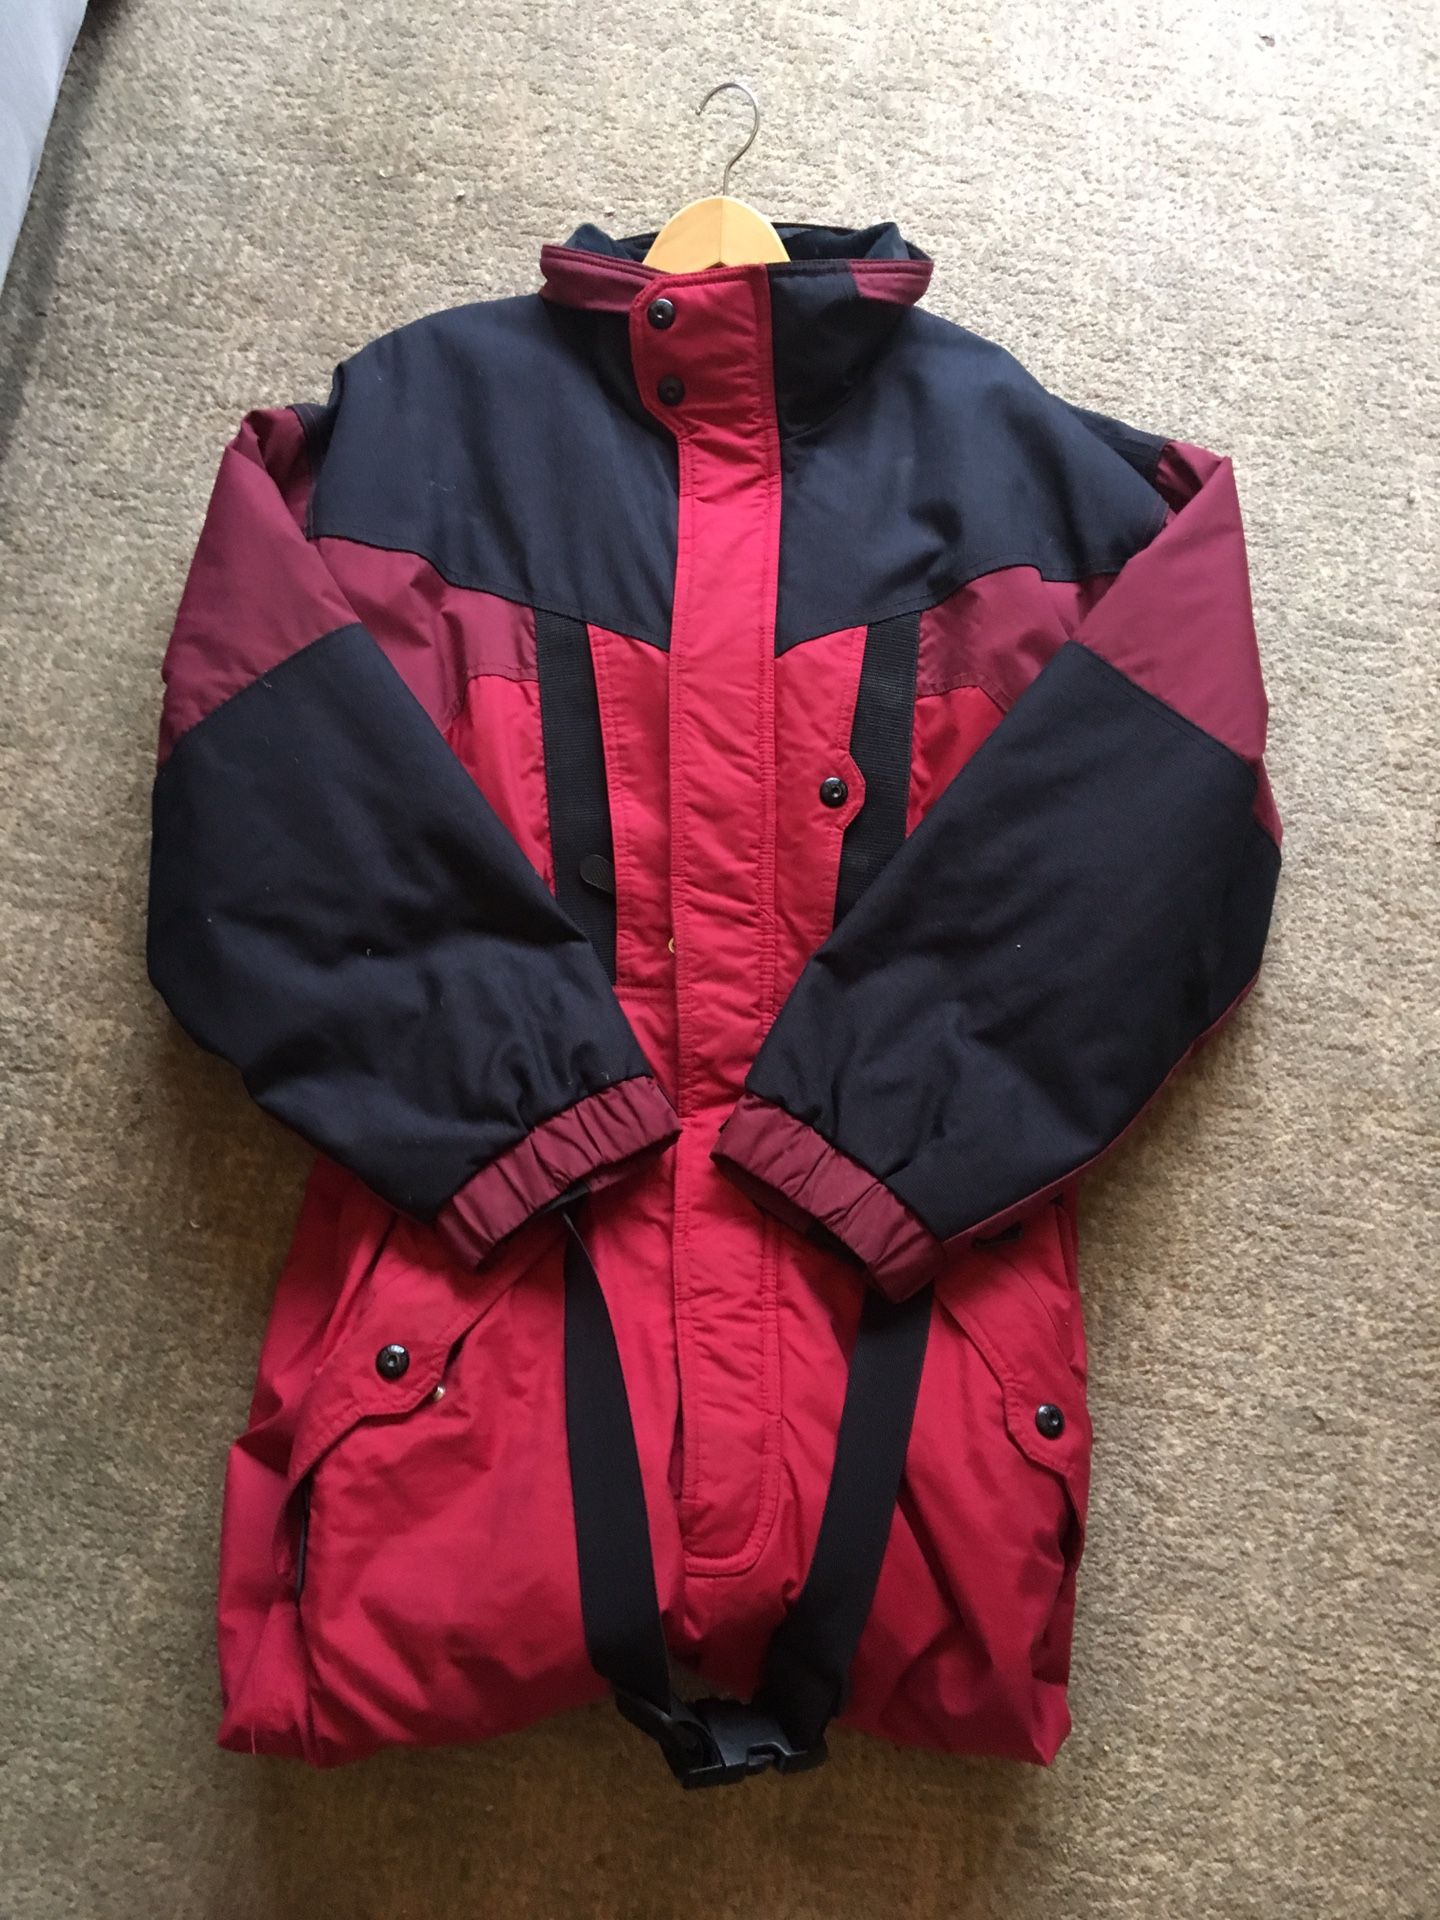 Snowmobile/ski suit